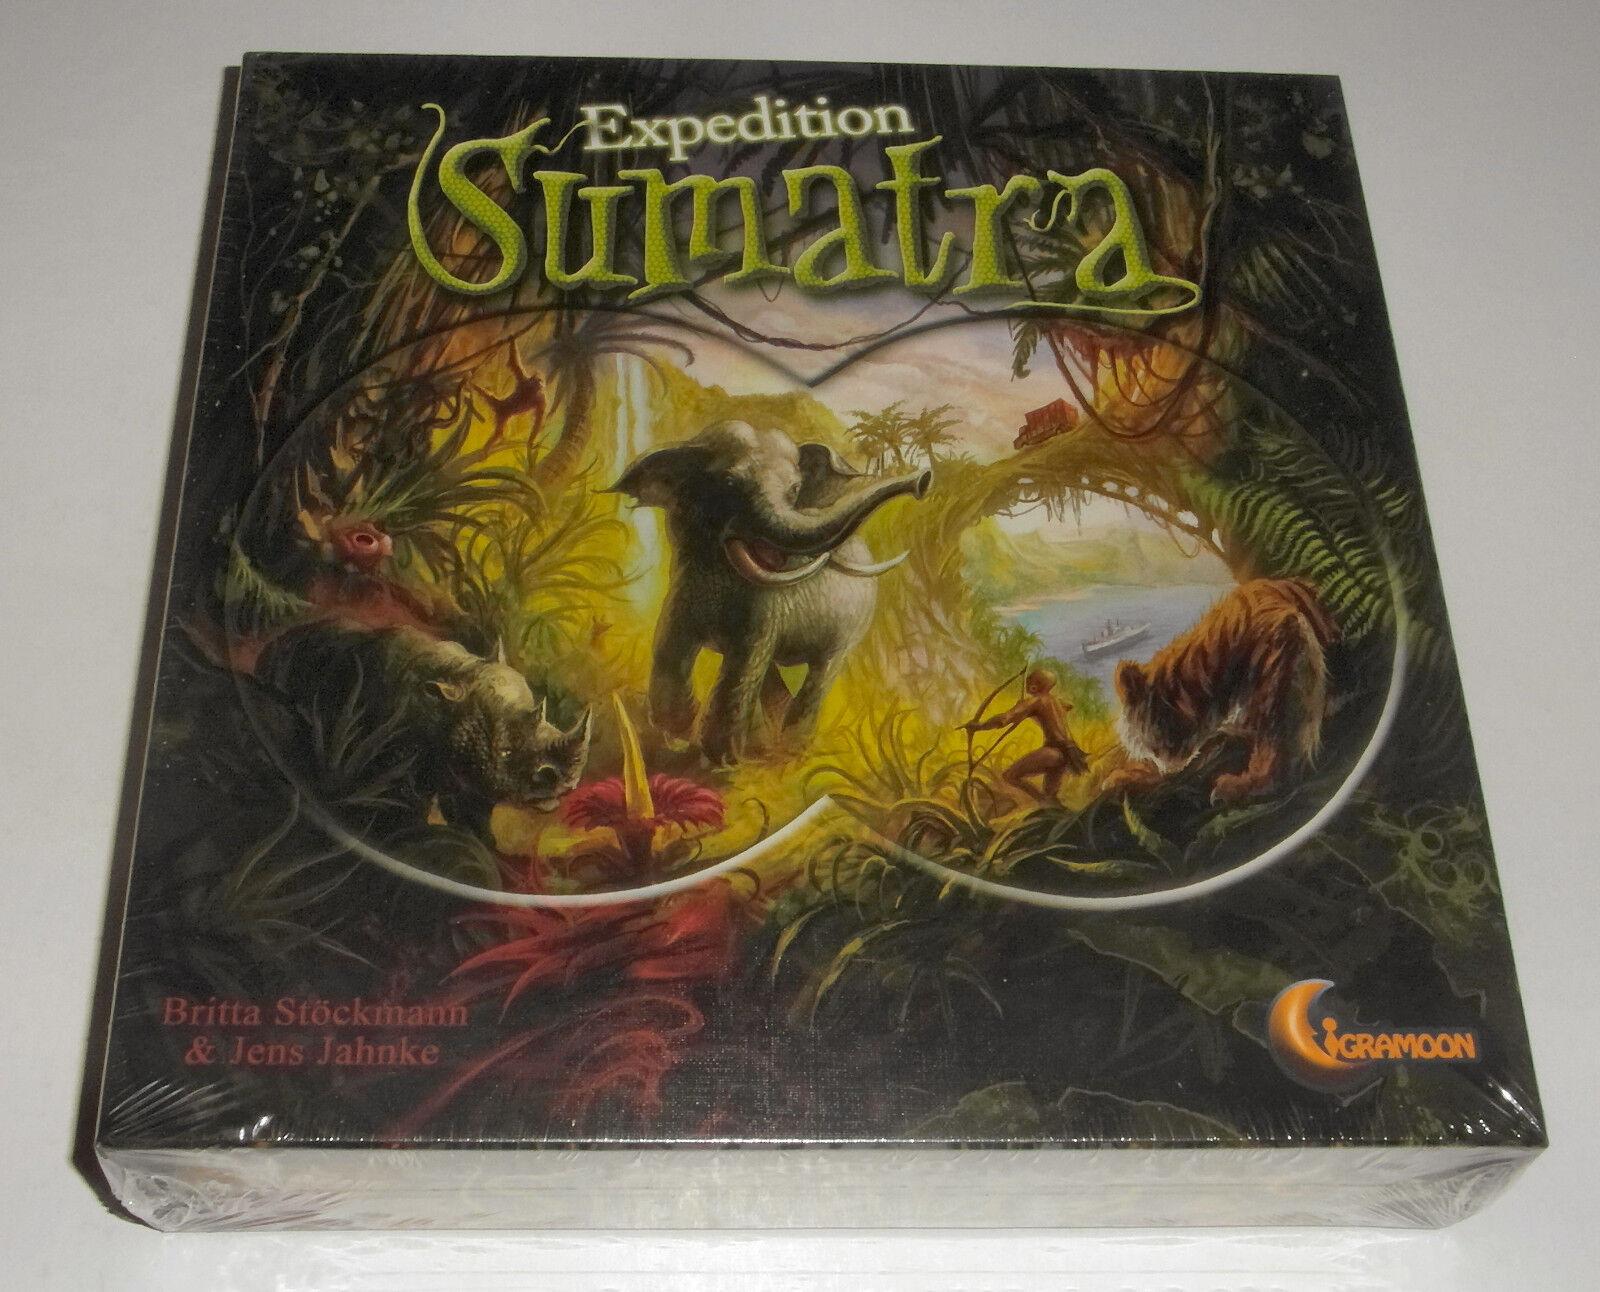 Expedition Sumatra -  - Igramoon Spieleverlag  -  2010 6e71e2